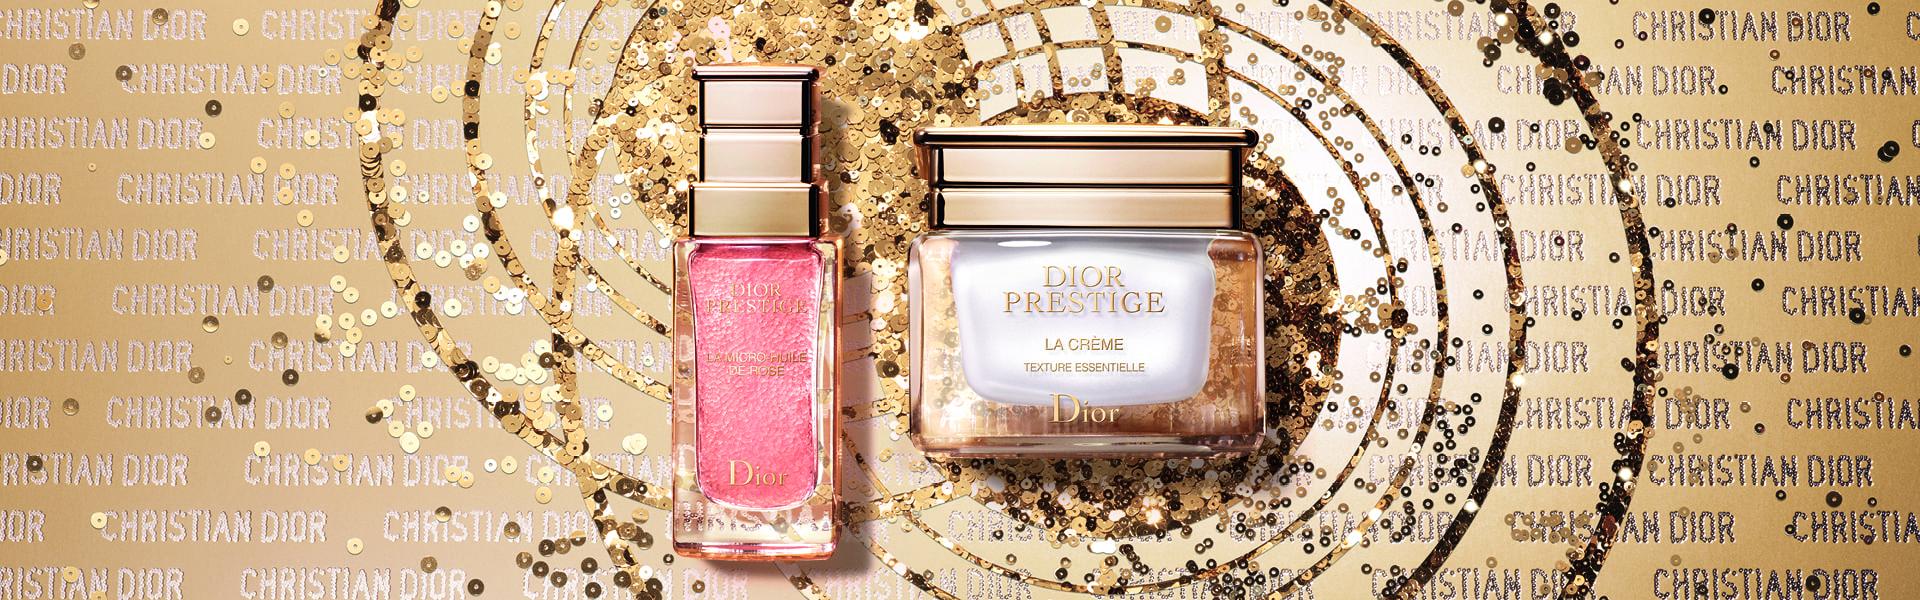 Dior Beauty, Skincare, Age Delay Skincare Regime, Dior Prestige, Cleansers, Toners, Hydration, Protection, Premium Skincare